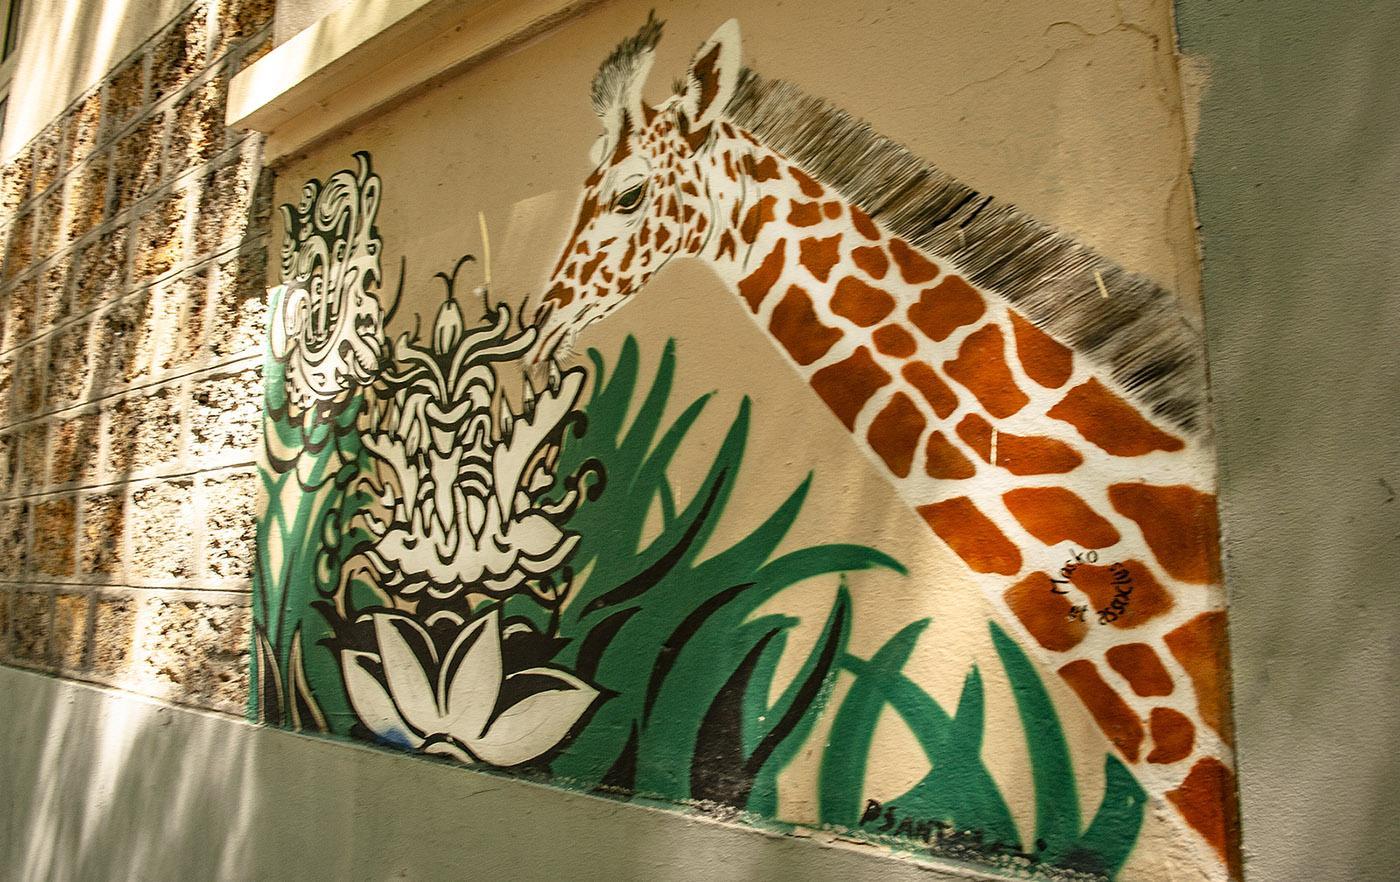 Grüne Street Art, gespottet in der Rue des Rigoles. Foto: Hilke Maunder